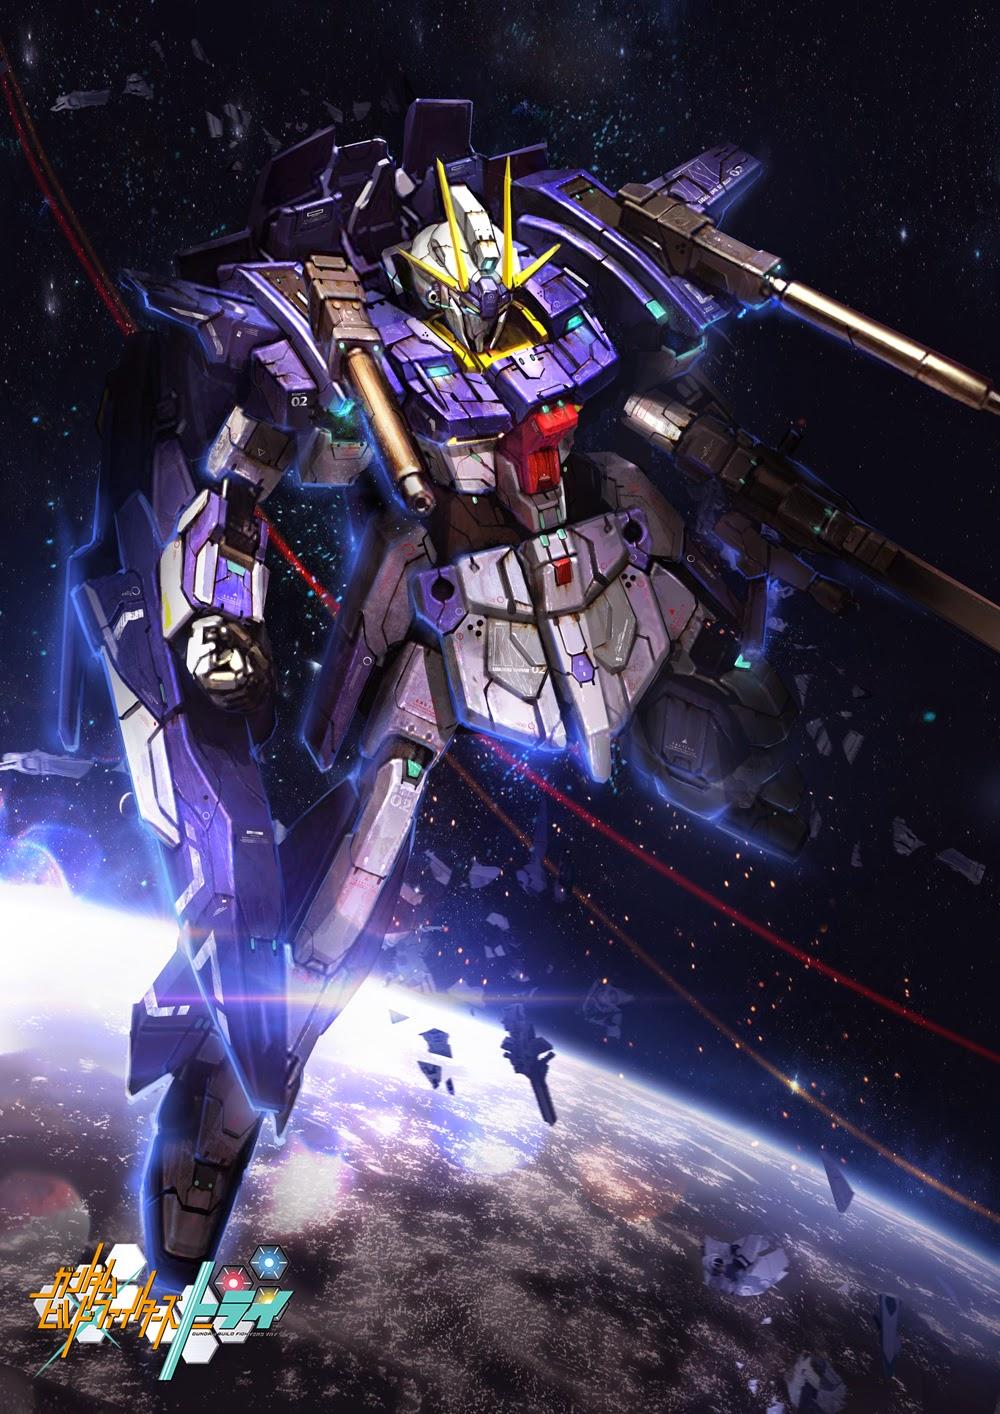 Fanart: Awesome Gundam Wallpapers by thedurrrrian - Gundam